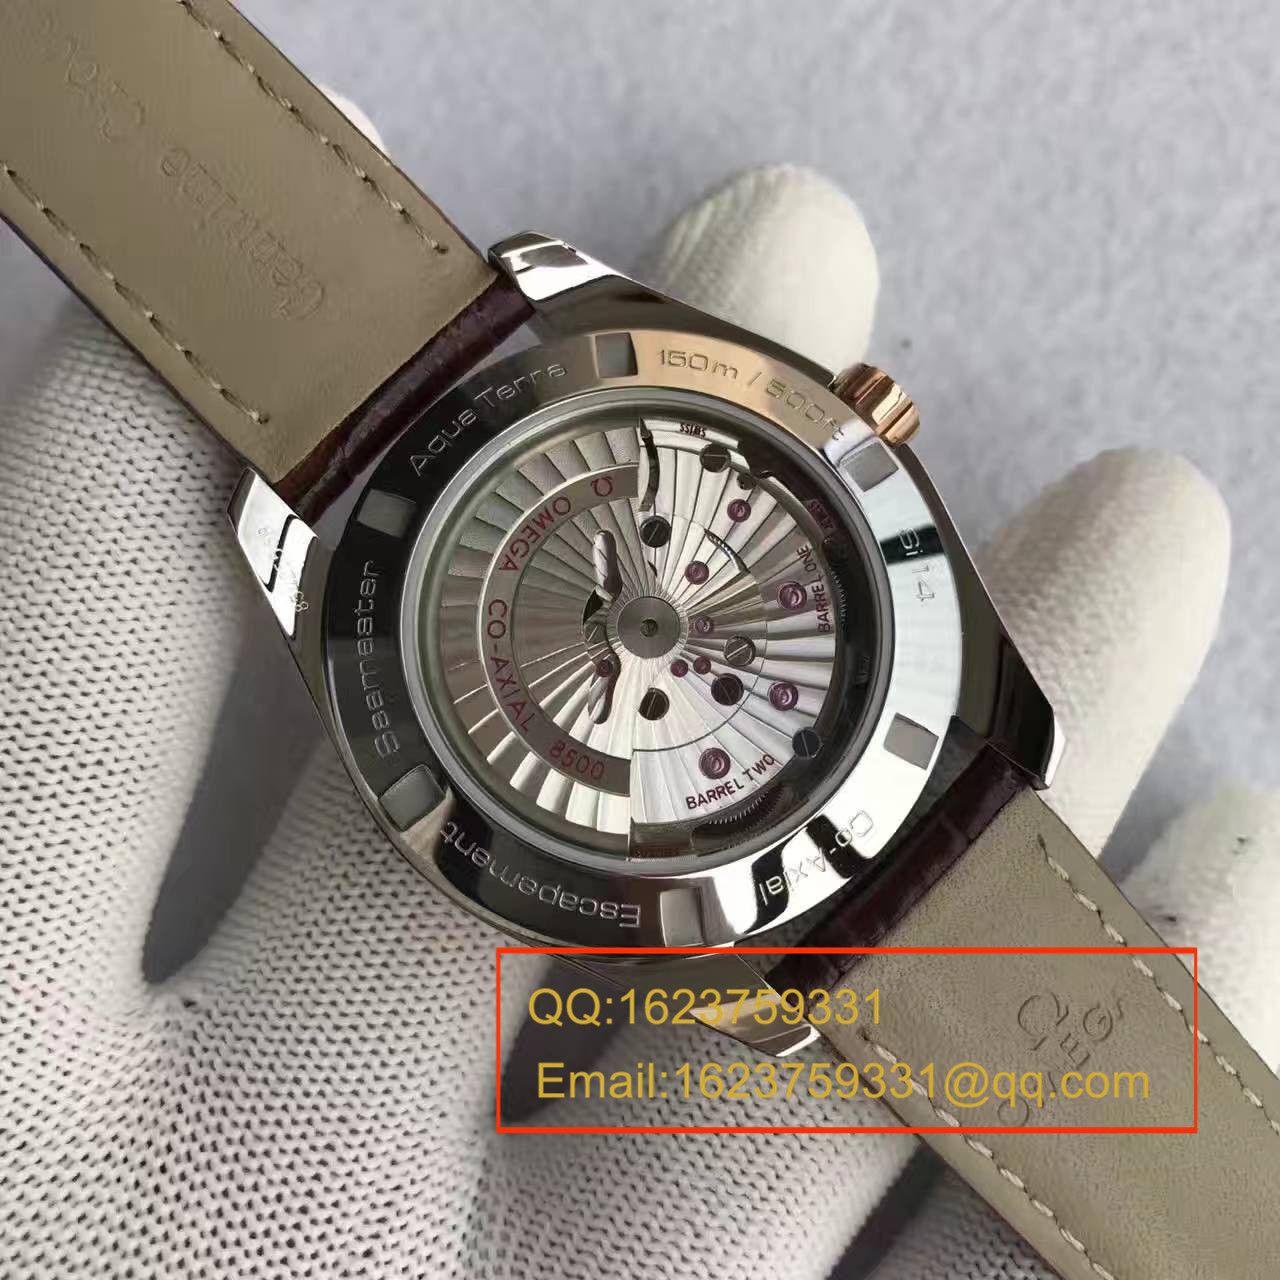 【KW厂一比一超A精仿手表】欧米茄海马AT150米系列231.23.42.21.02.001腕表